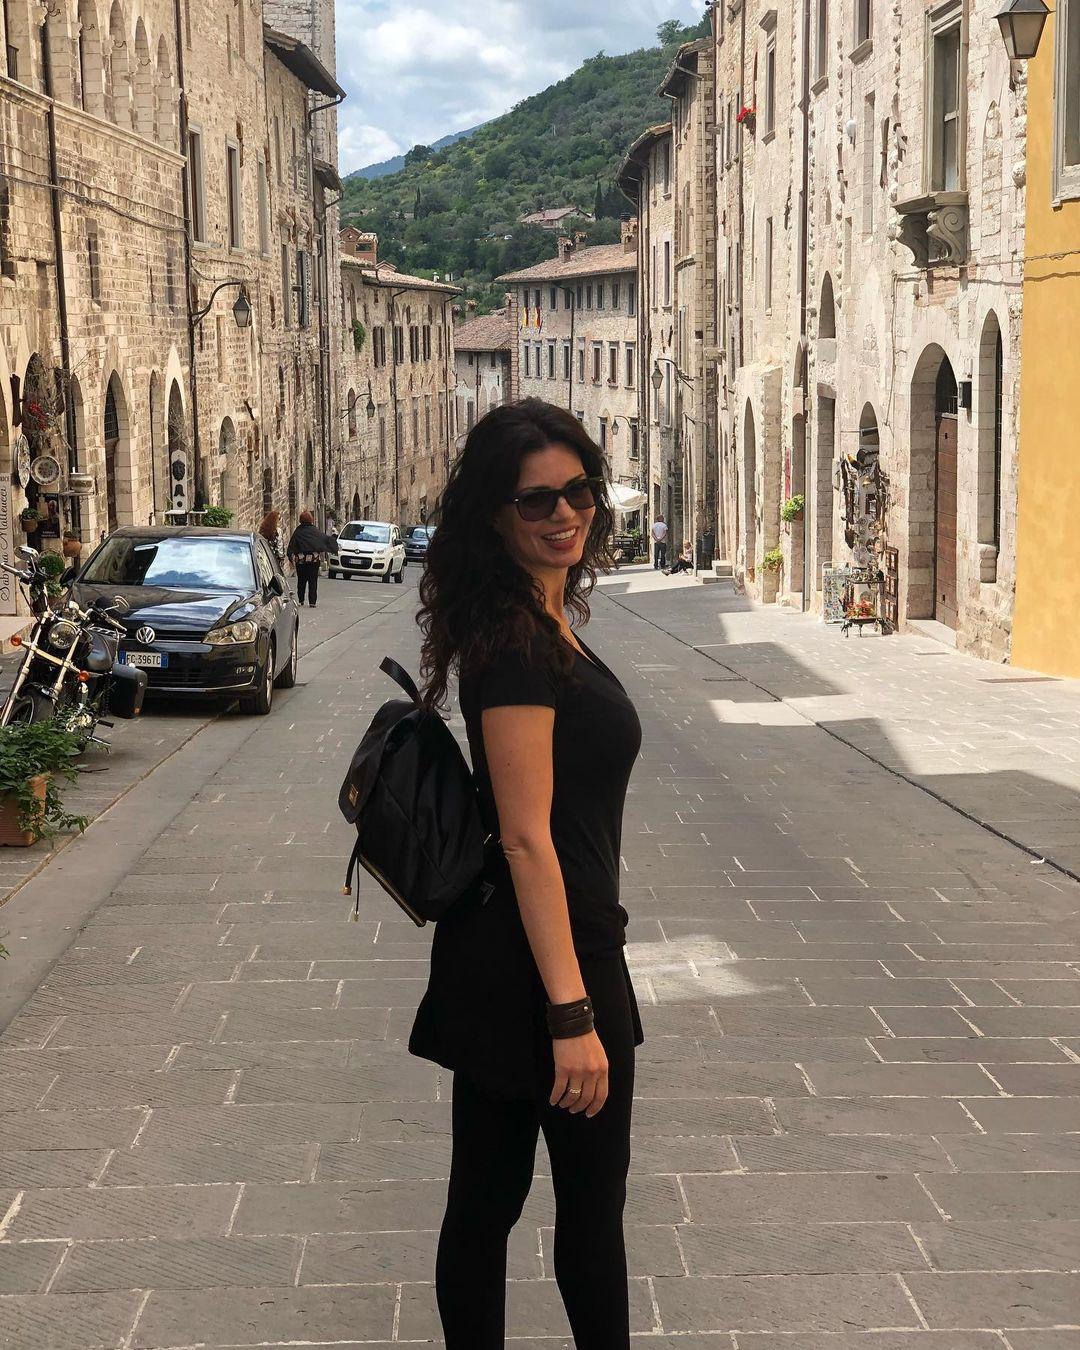 Laura-Torrisi-Wallpapers-Insta-Fit-Bio-1